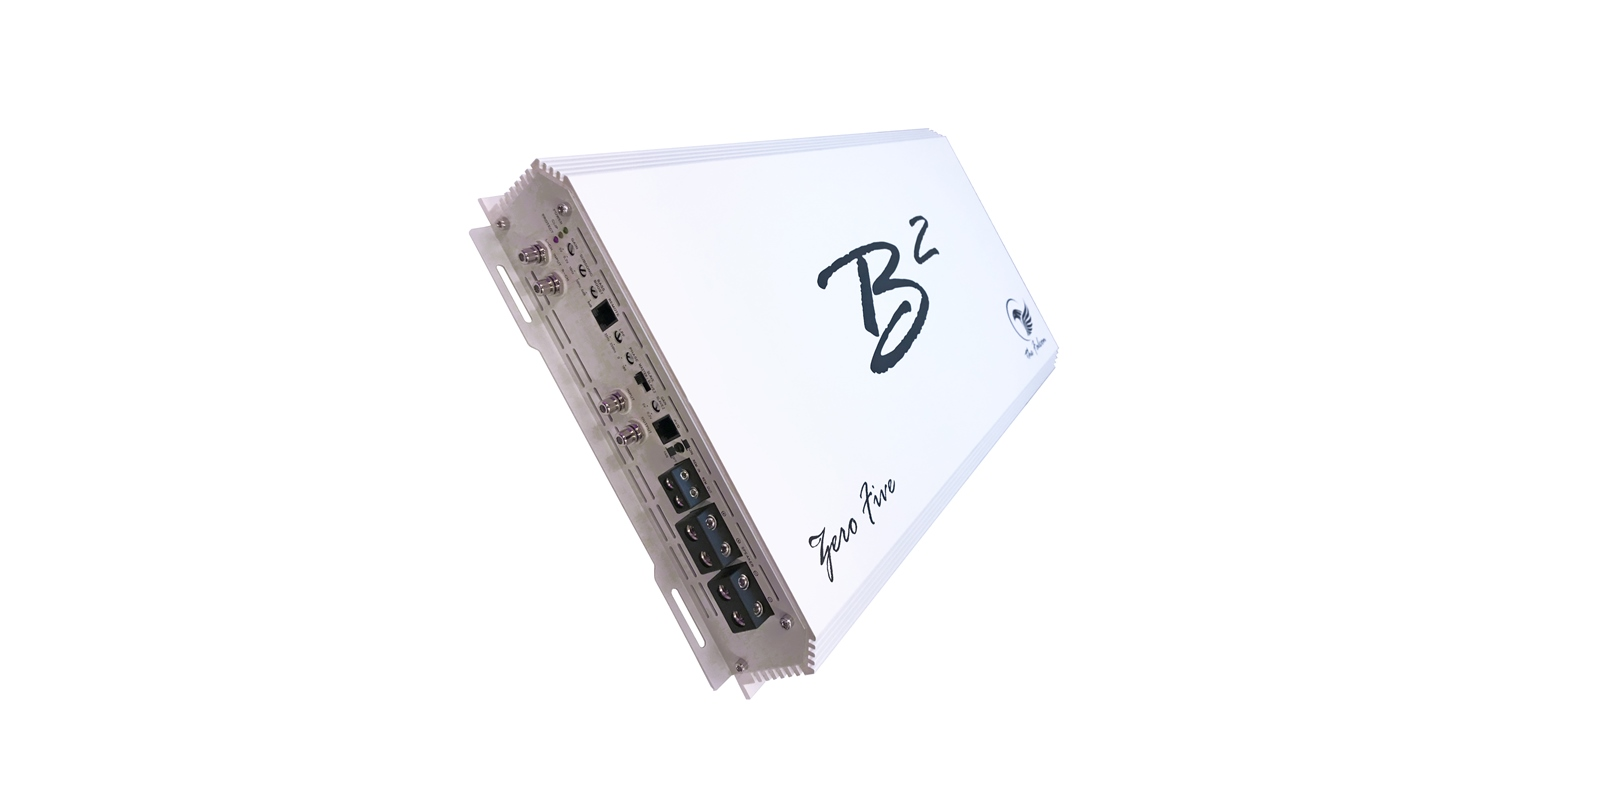 B2 audio Falcon amplifier